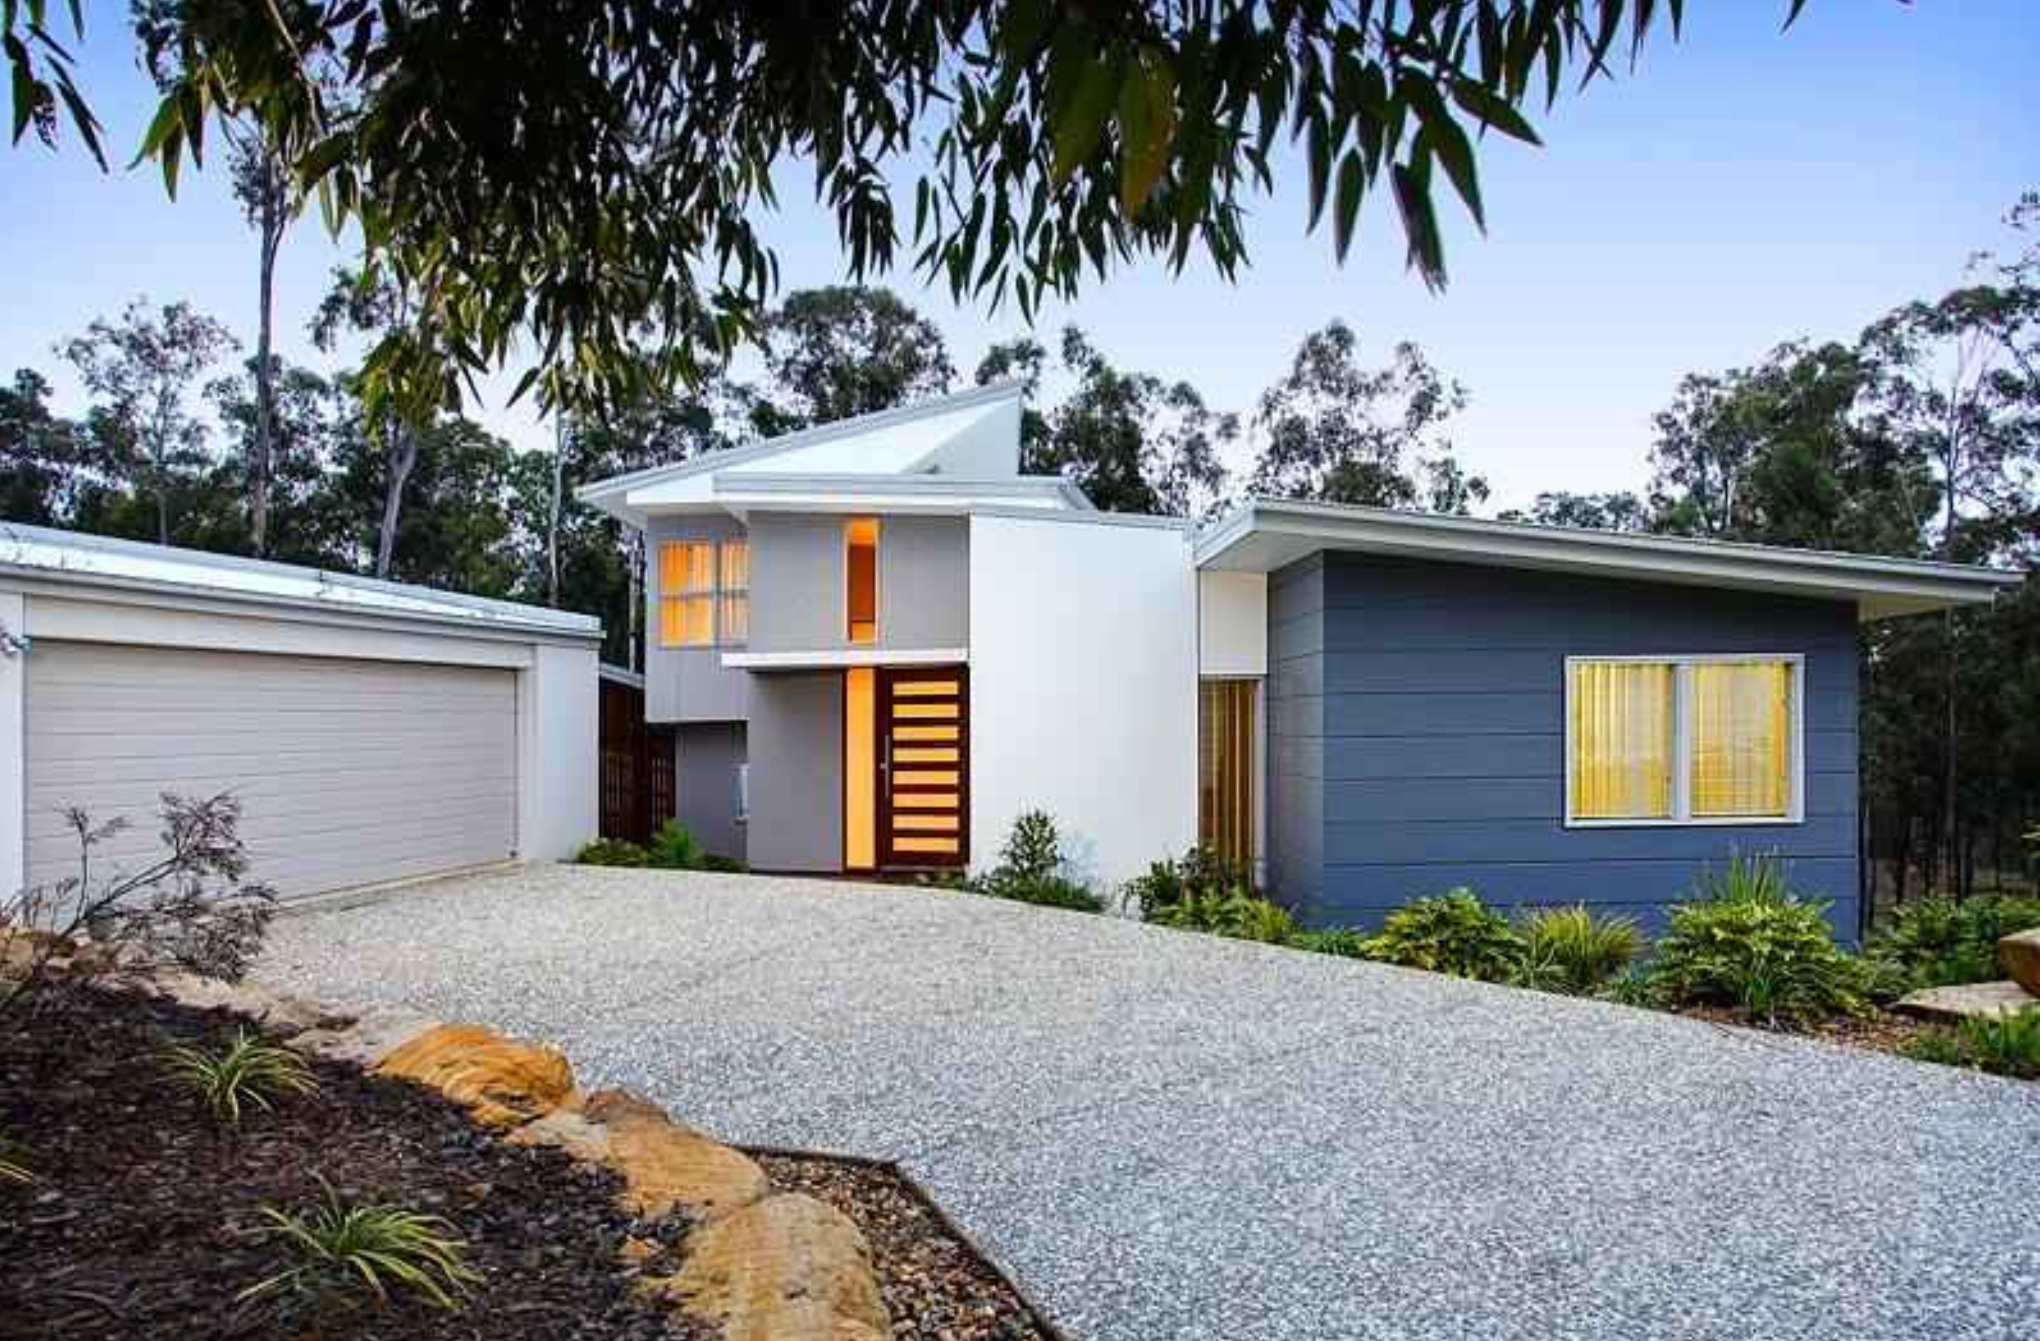 Skillion roof weatherboard colorbond exteriors - Colorbond exterior colour schemes ...